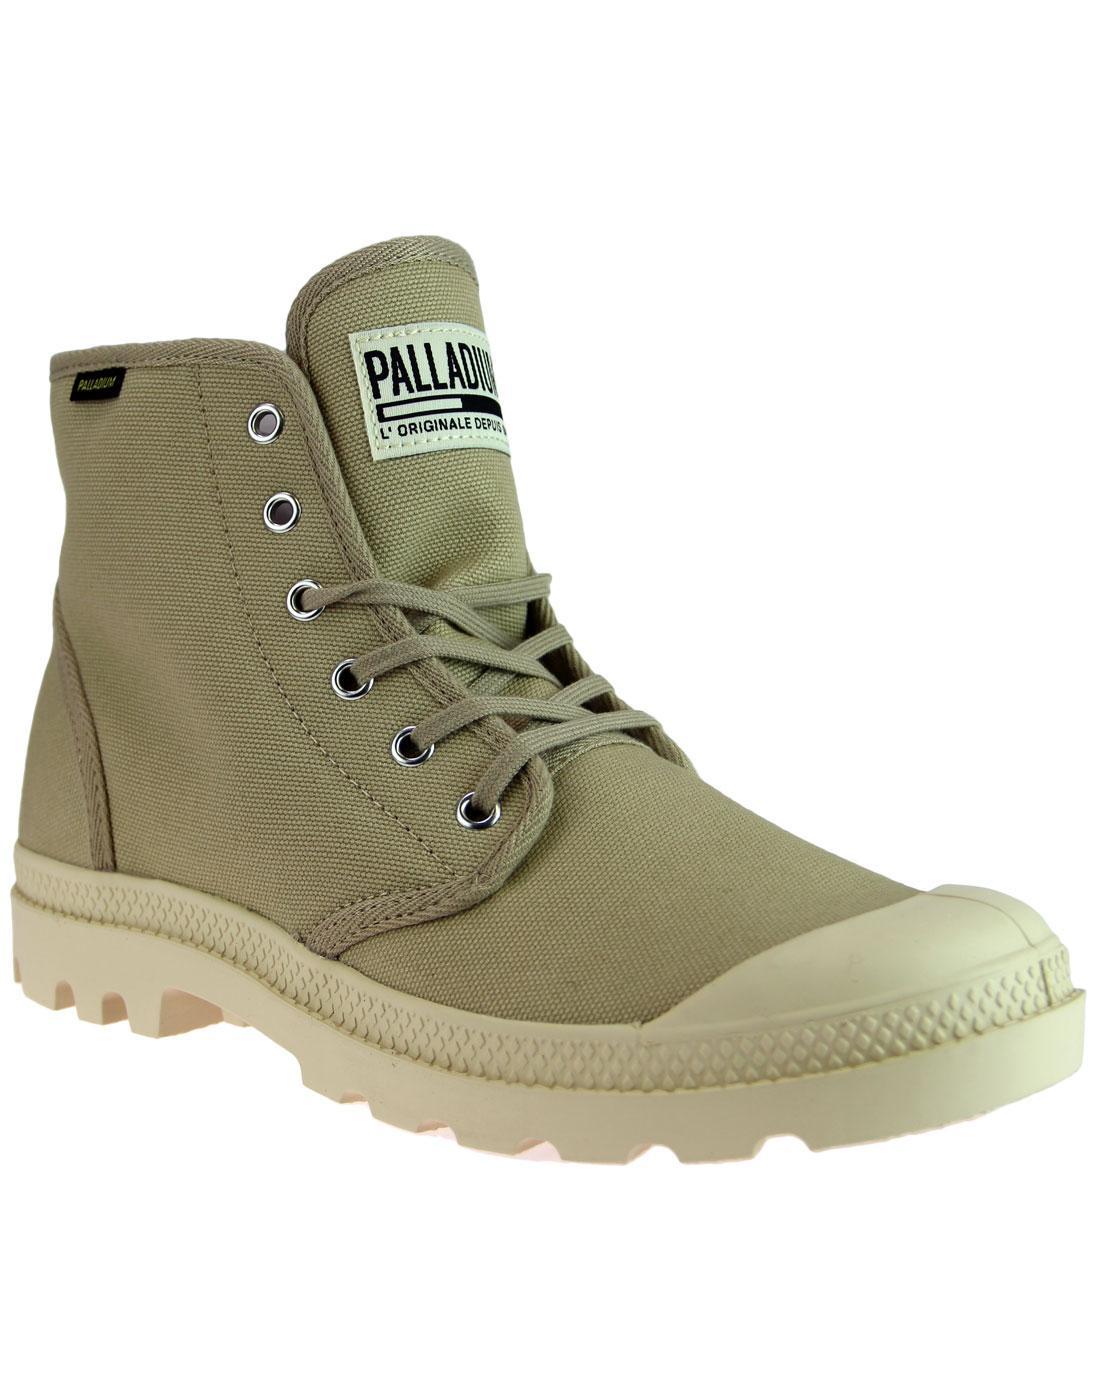 Pampa Hi Original PALLADIUM Men's Canvas Boots S/E